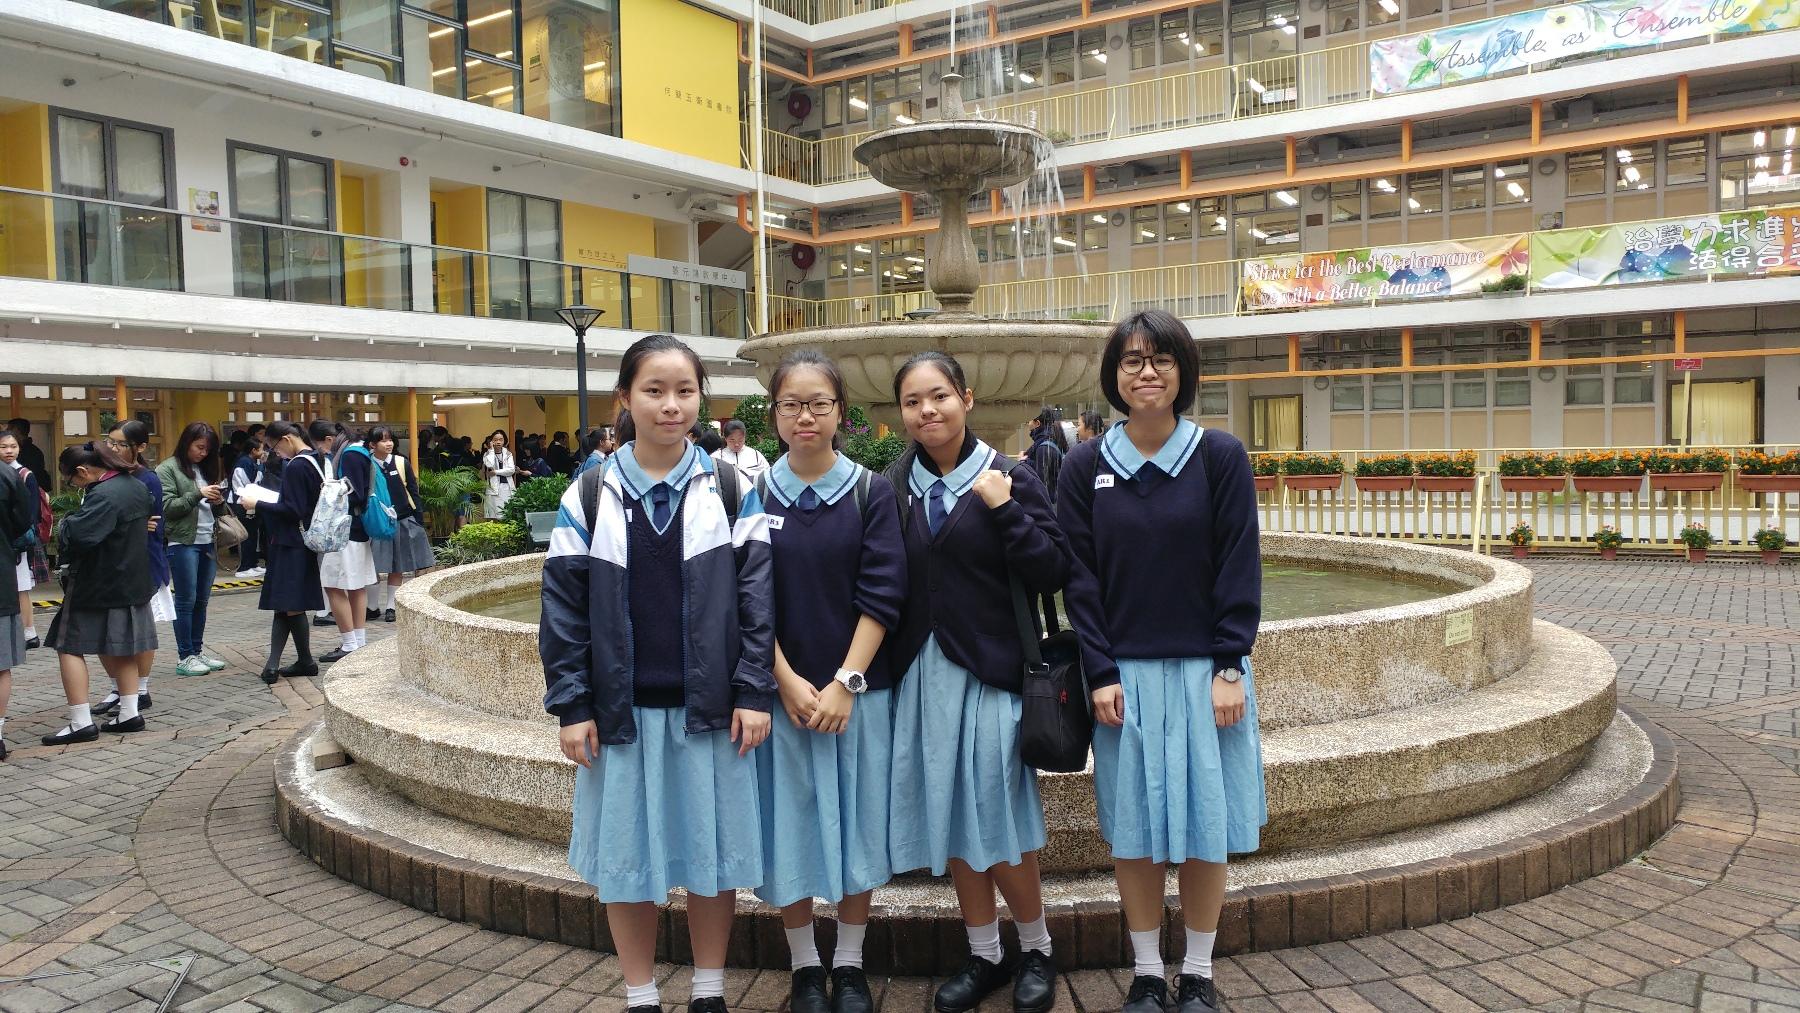 http://npc.edu.hk/sites/default/files/001_1.jpg